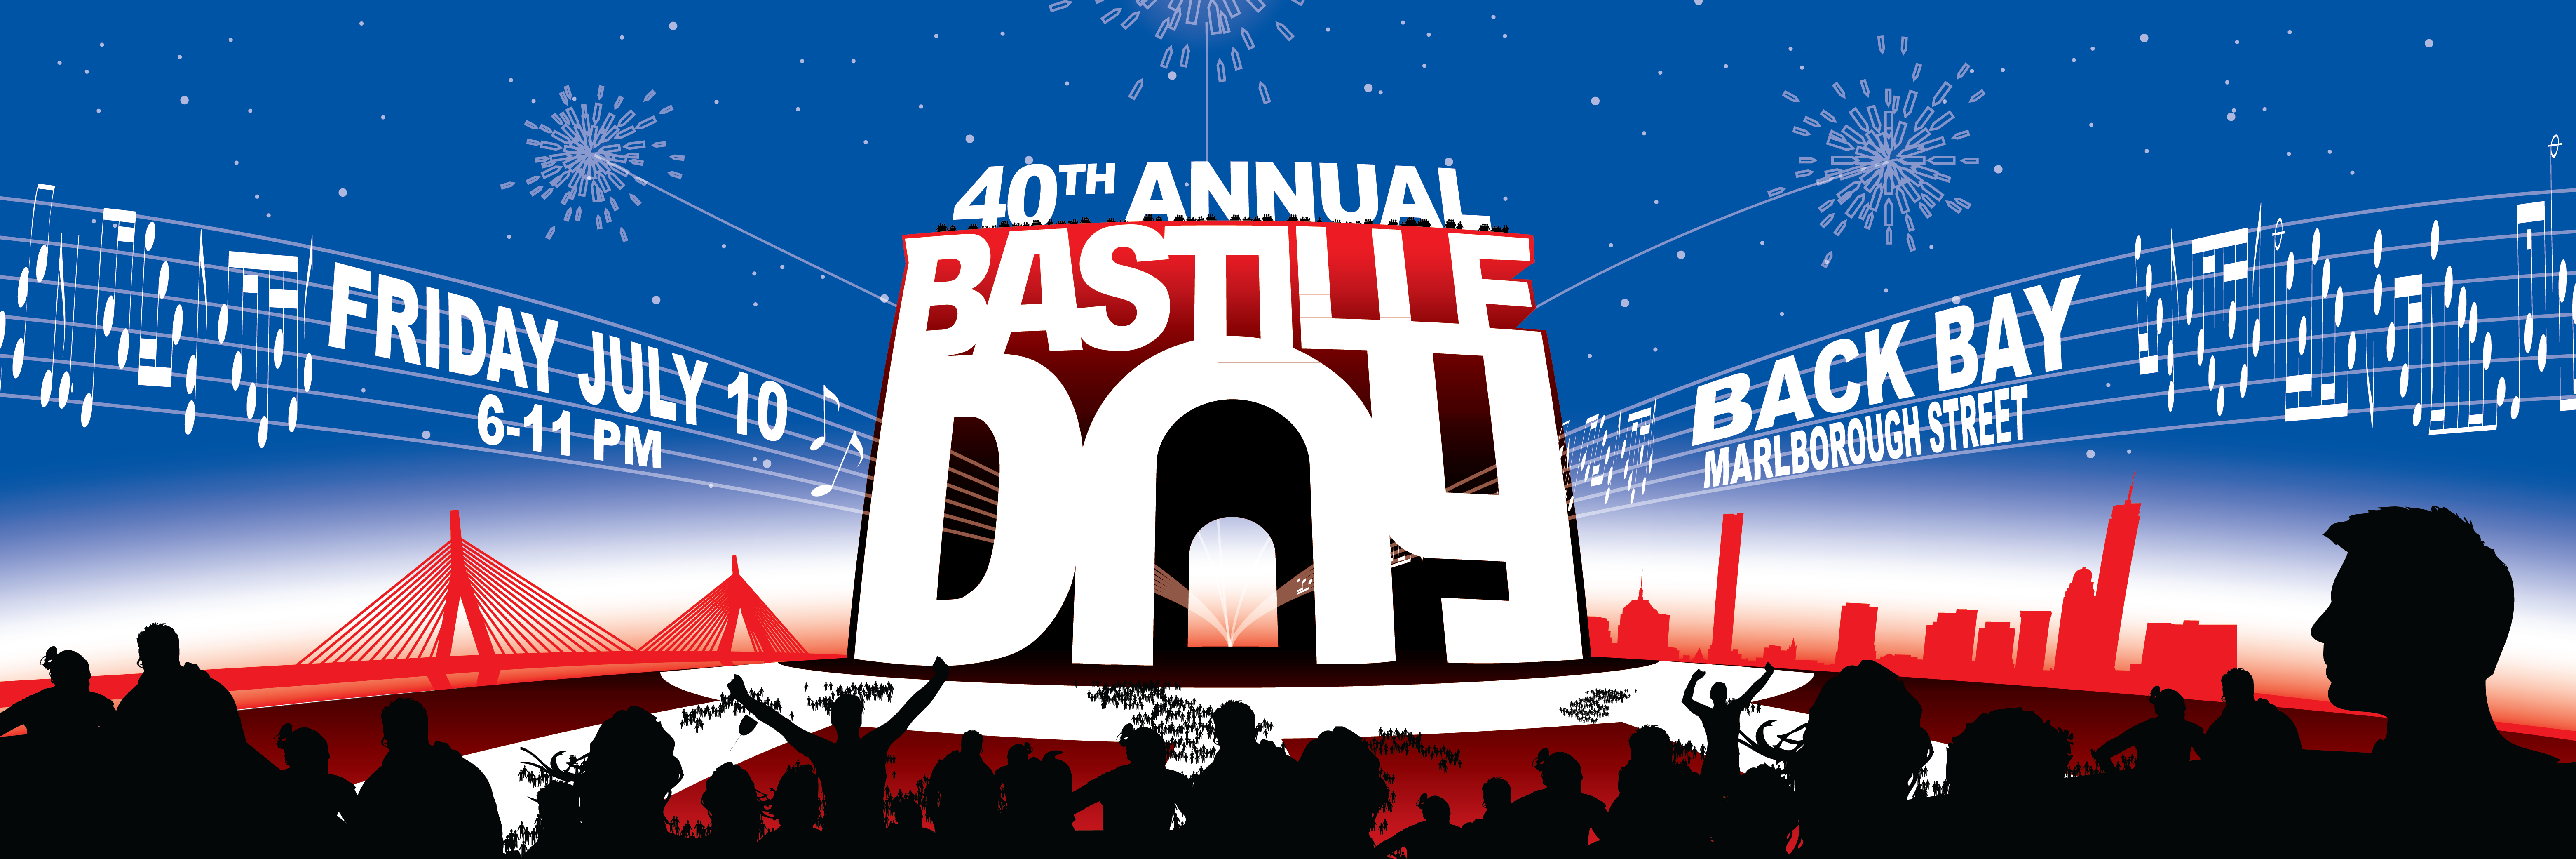 Bastille Day Online